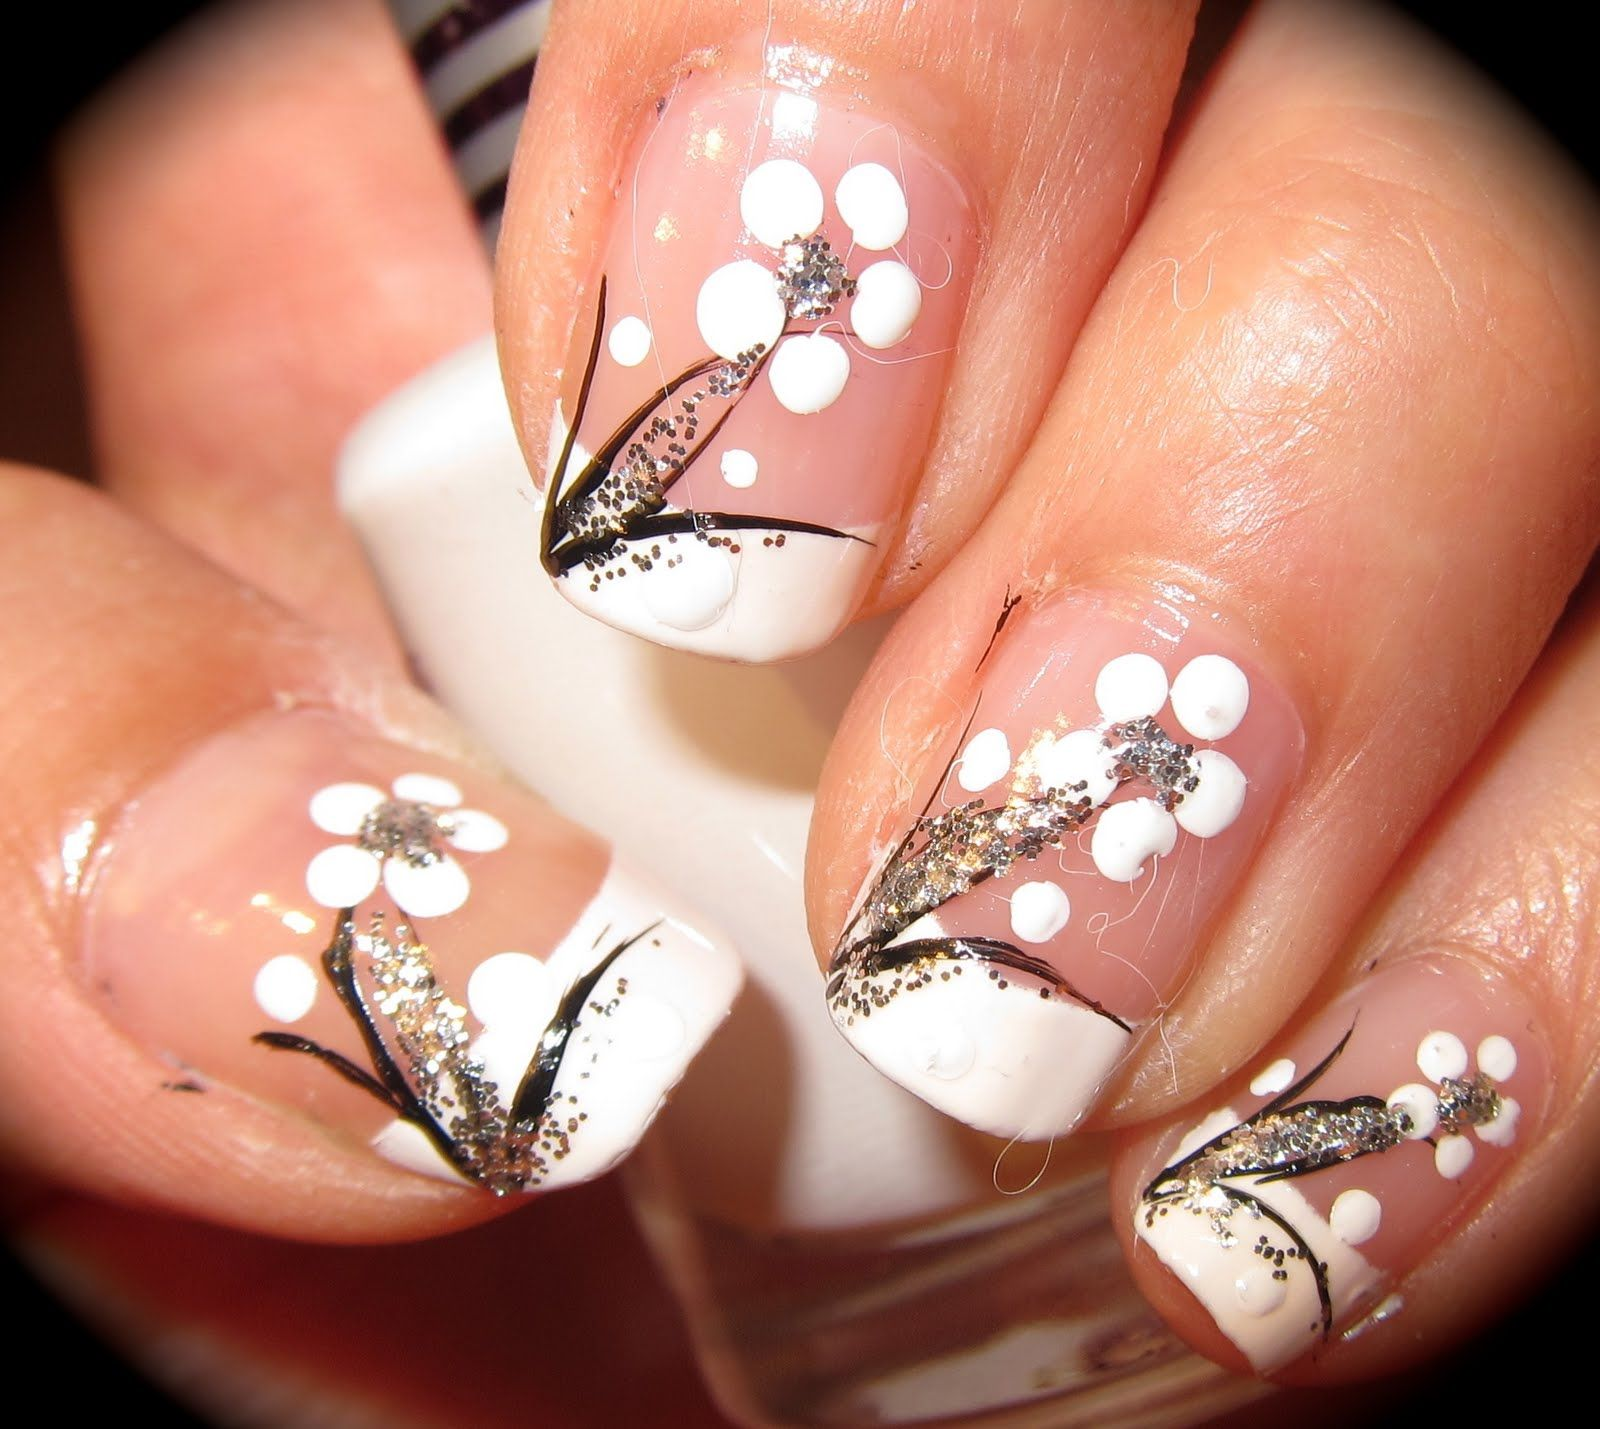 Nail Design Art 2015 Latest Nail Art Fashion for Girls ...